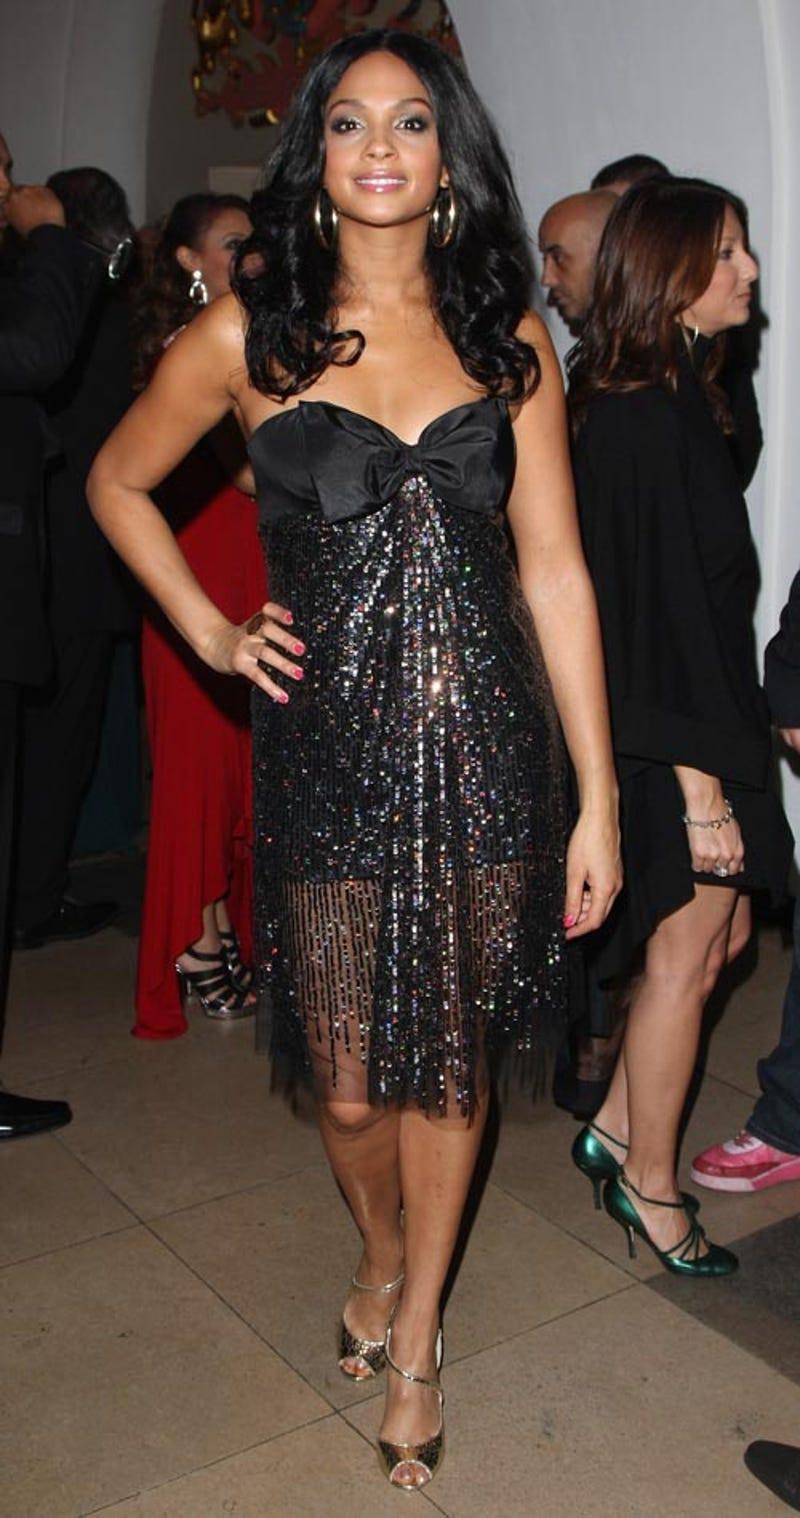 Alesha dixon pictures cosmopolitan ultimate women of the year awards - Alesha Dixon Pictures Cosmopolitan Ultimate Women Of The Year Awards 69